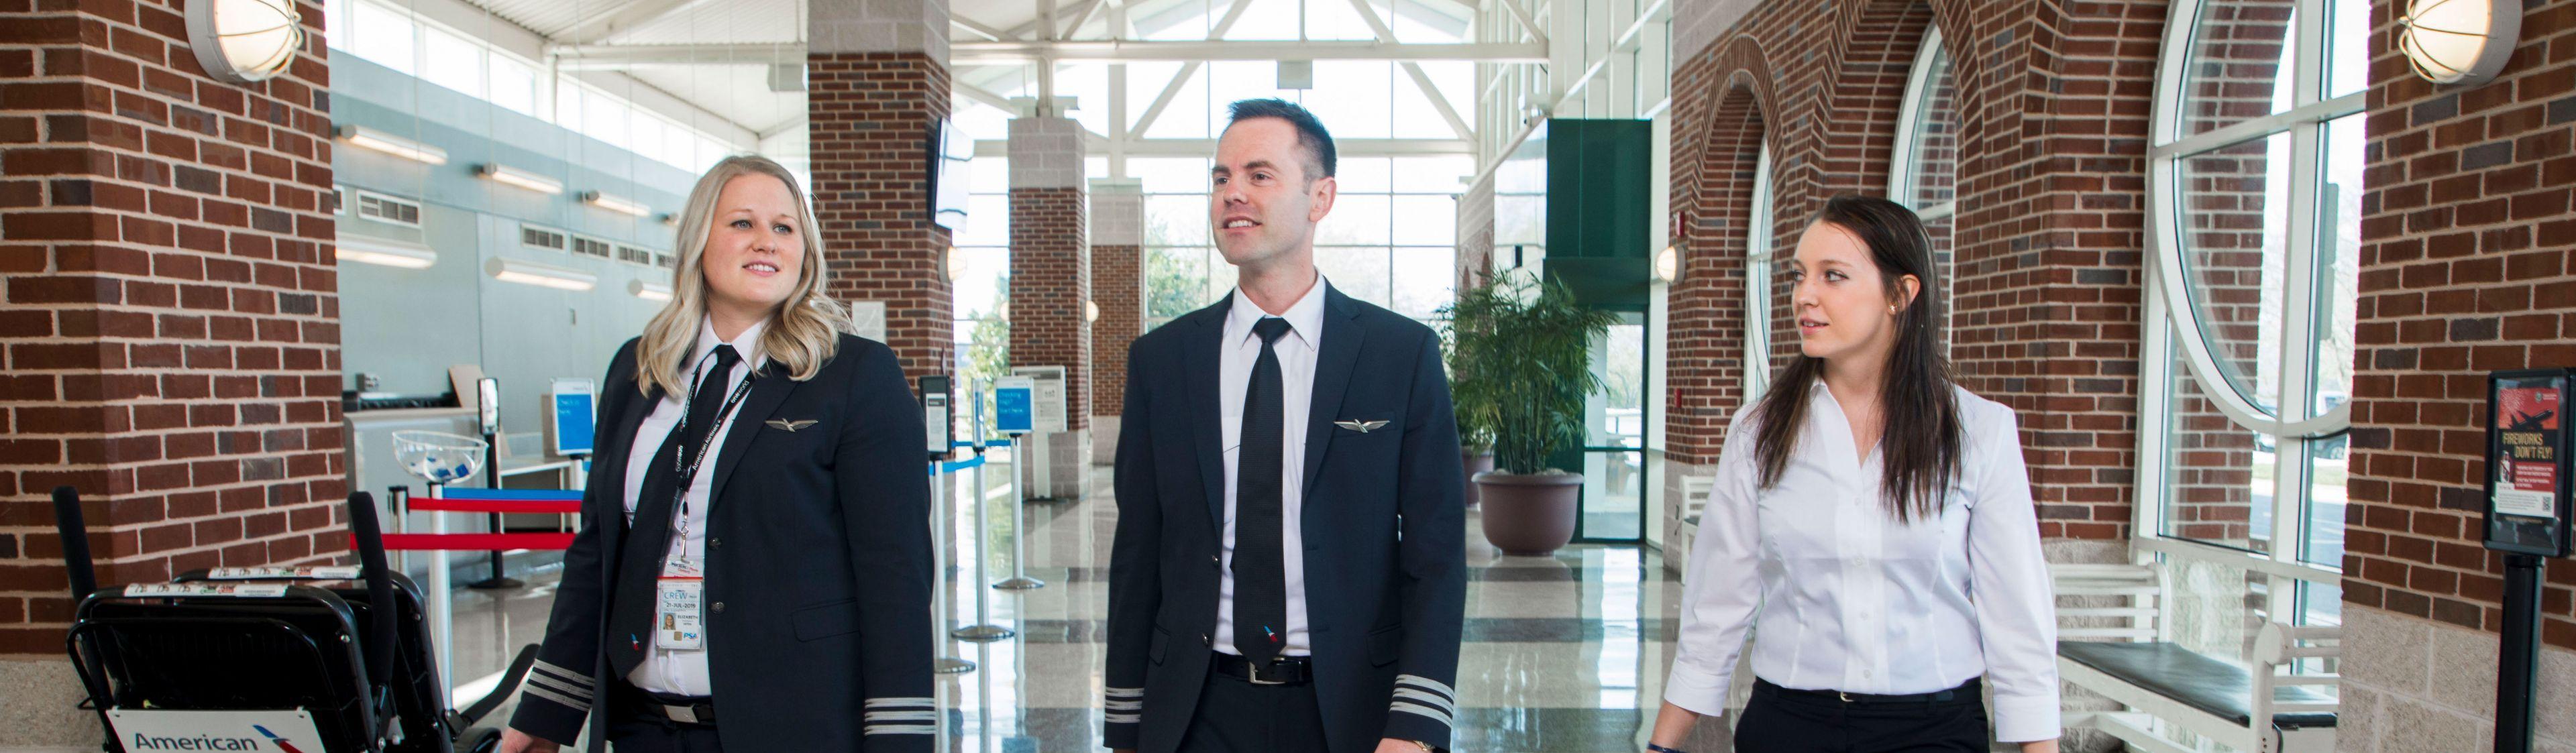 Aeronautics Associate Degrees Aviation Degrees From Liberty University